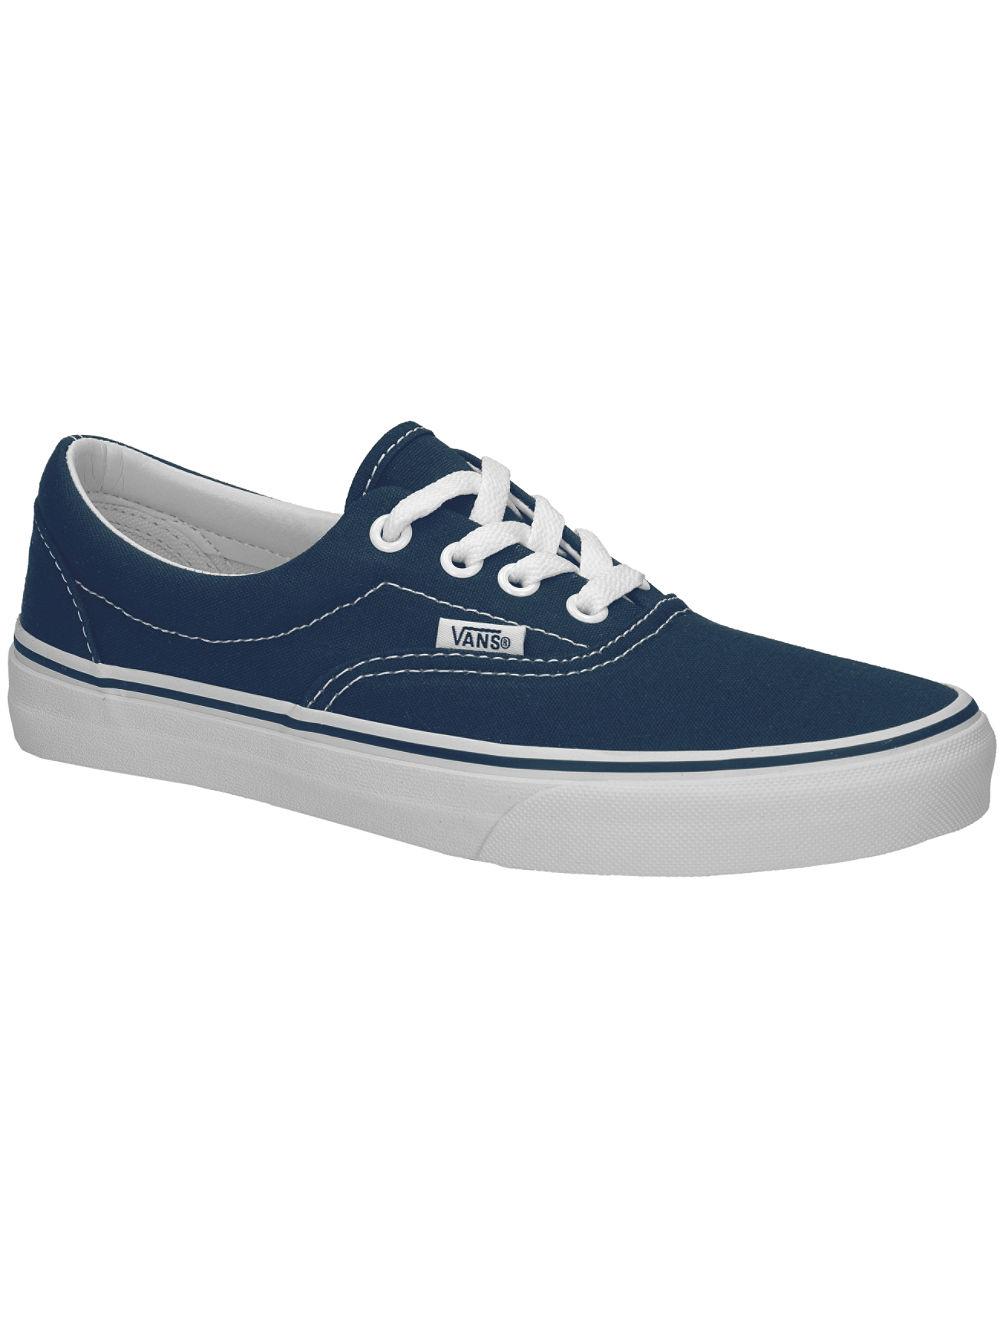 71ea5fd970 Buy Vans Era Sneakers online at Blue Tomato